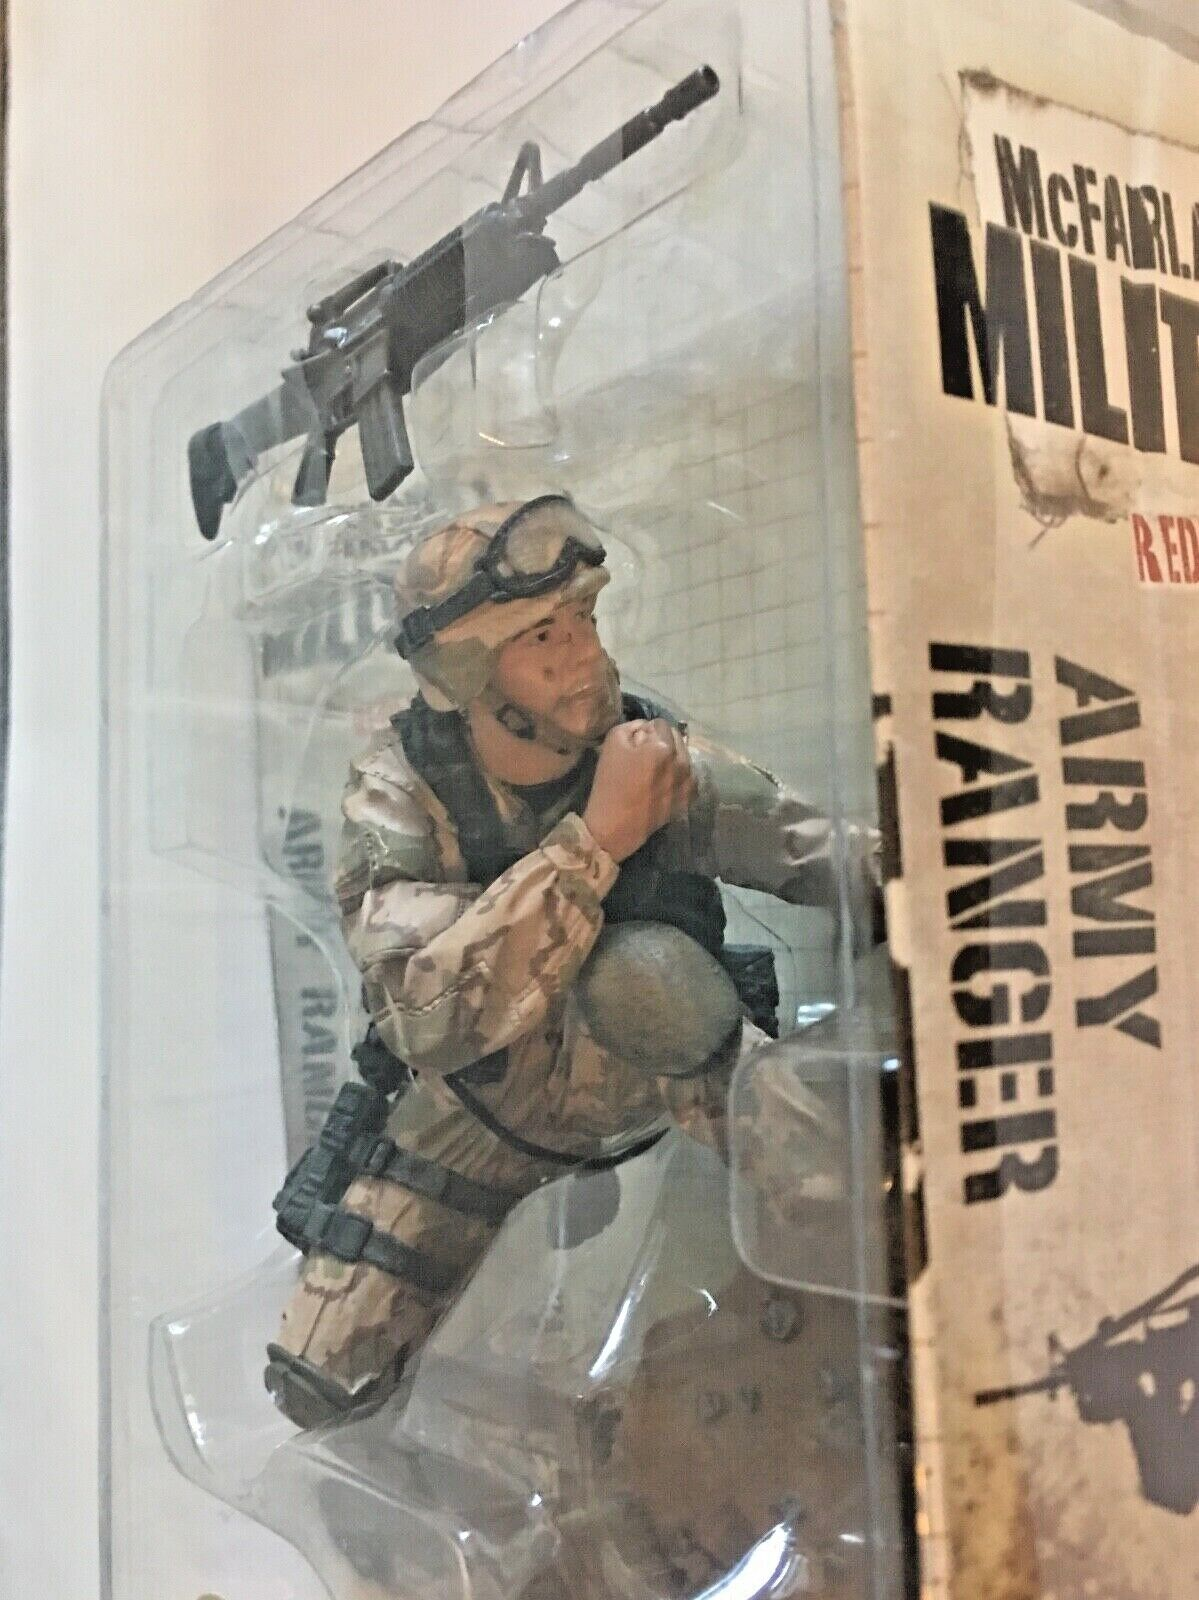 McFarlane's McFarlane's McFarlane's Military Redeployed, Army Ranger 891a0a